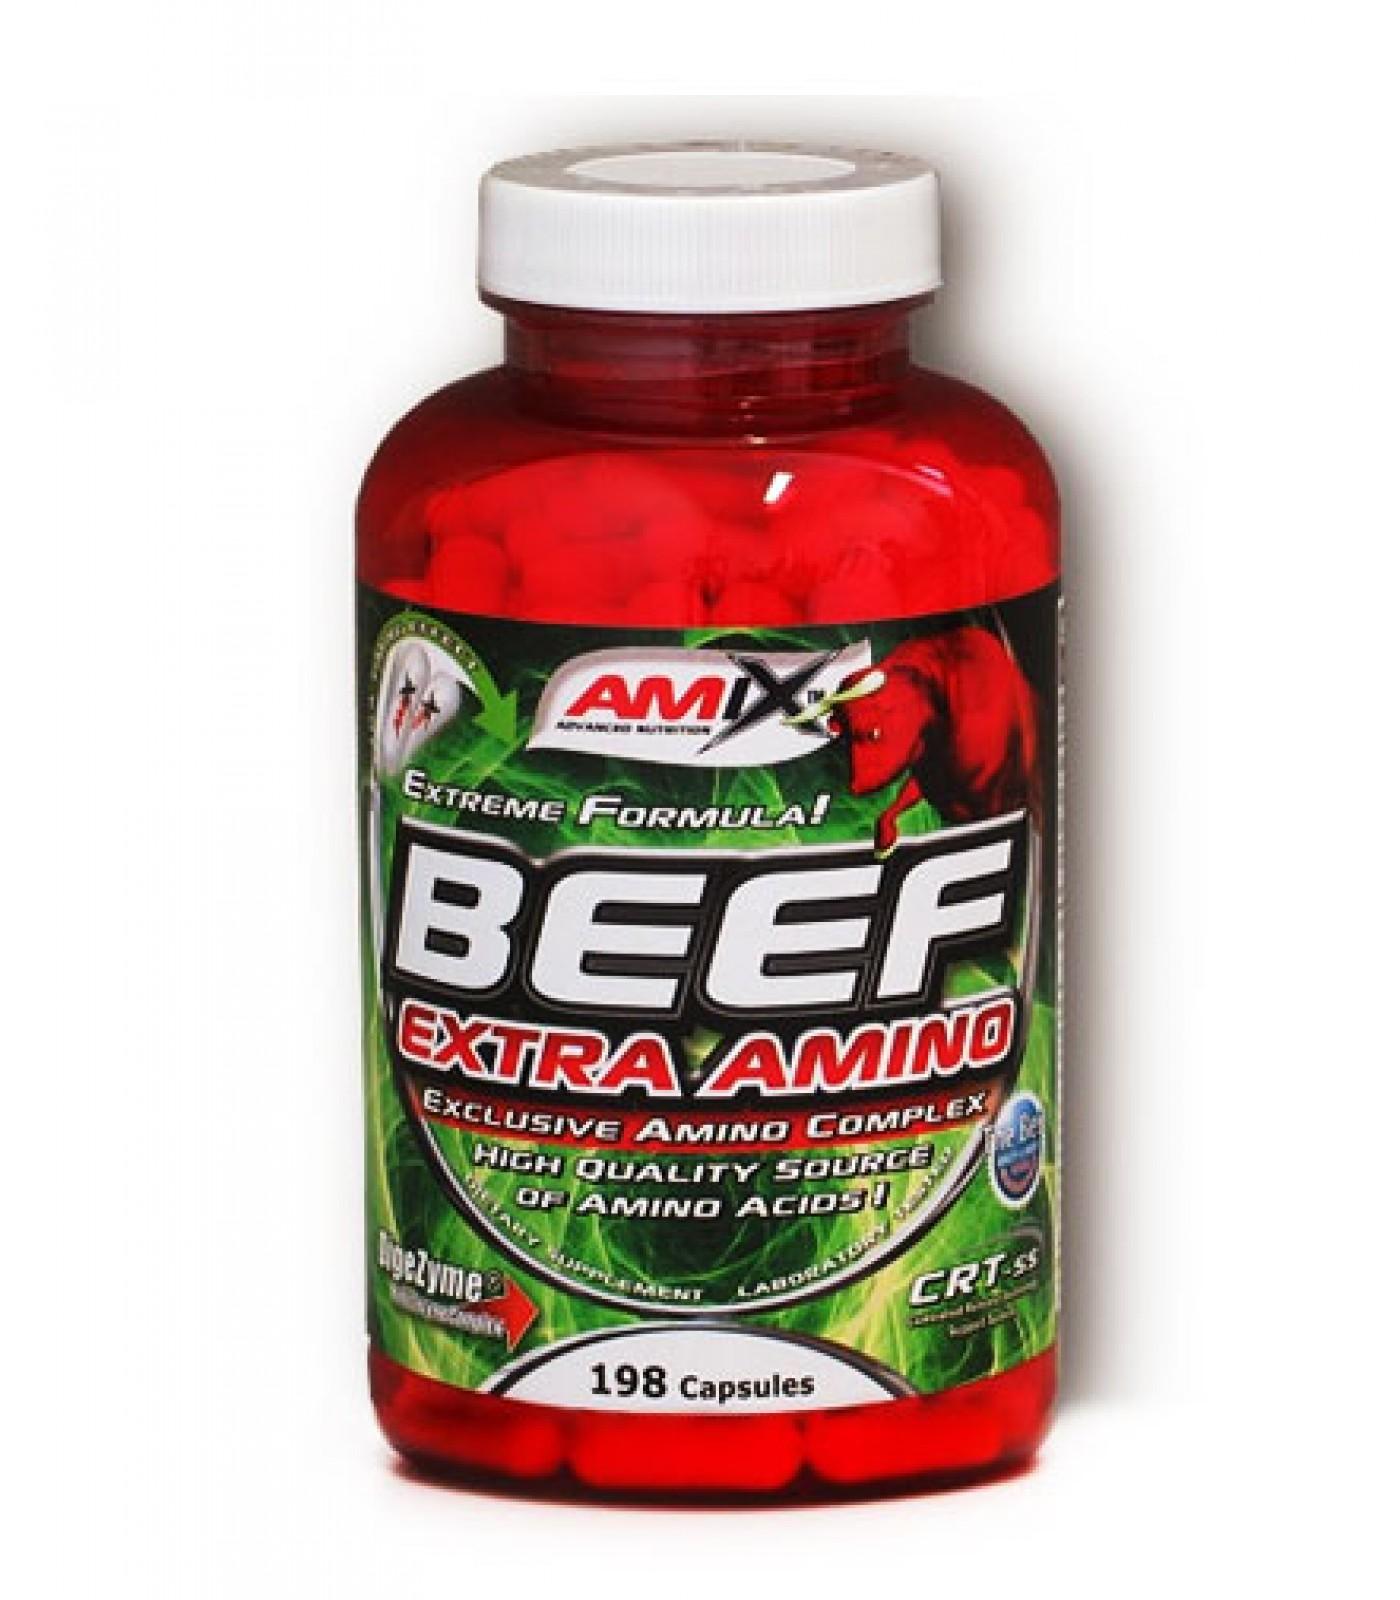 Amix - Beef Extra Amino / 198 caps.